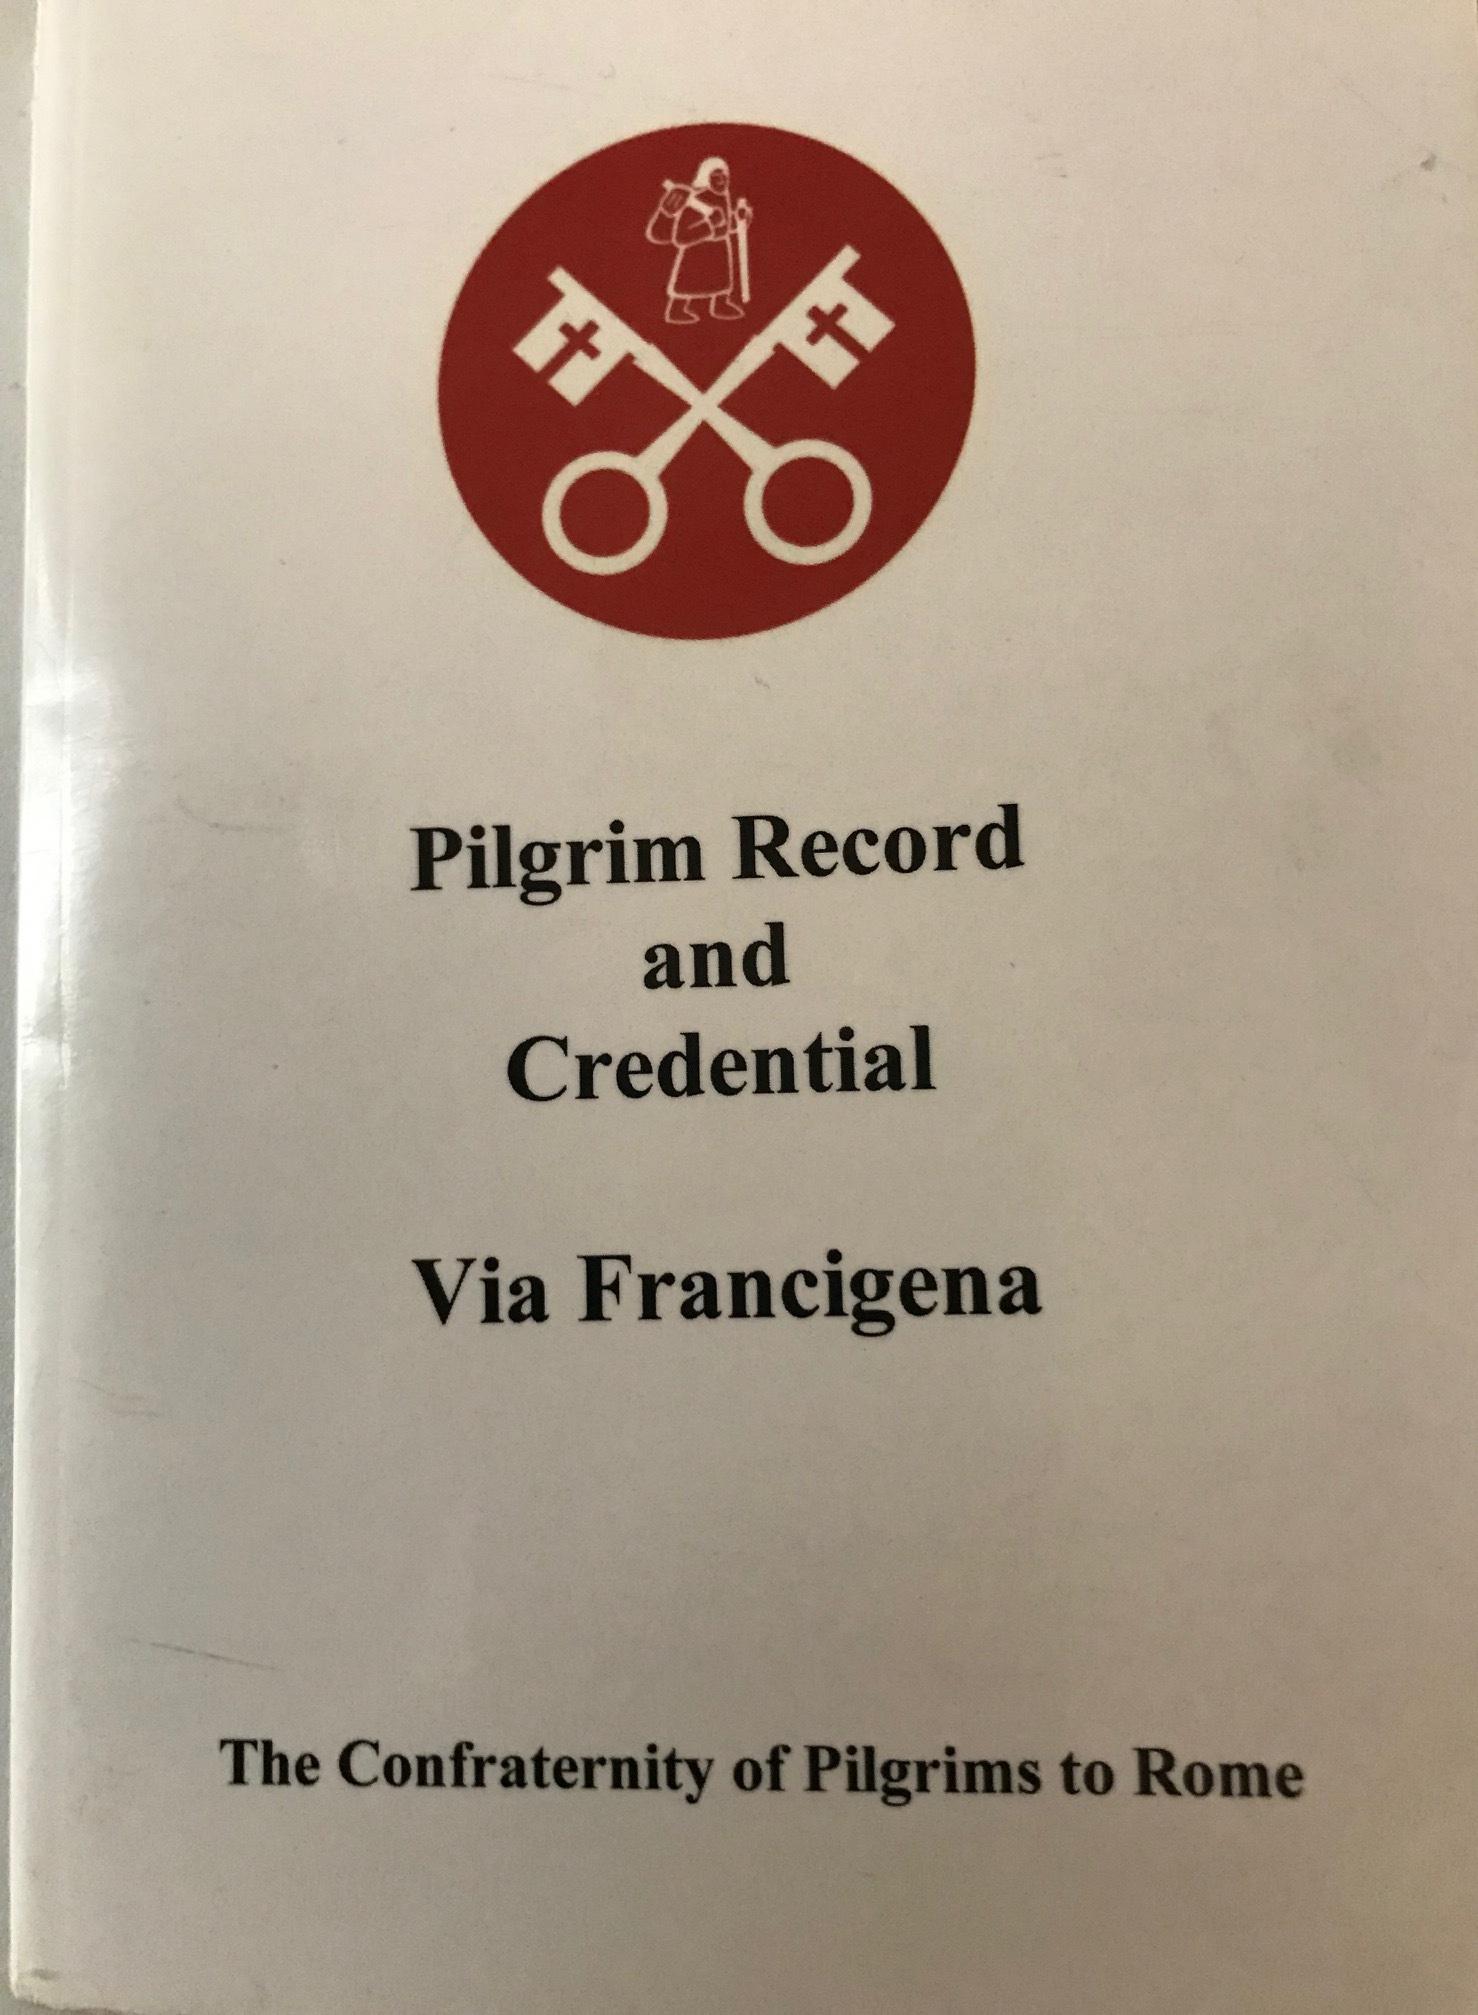 One of our Pilgrim Passports